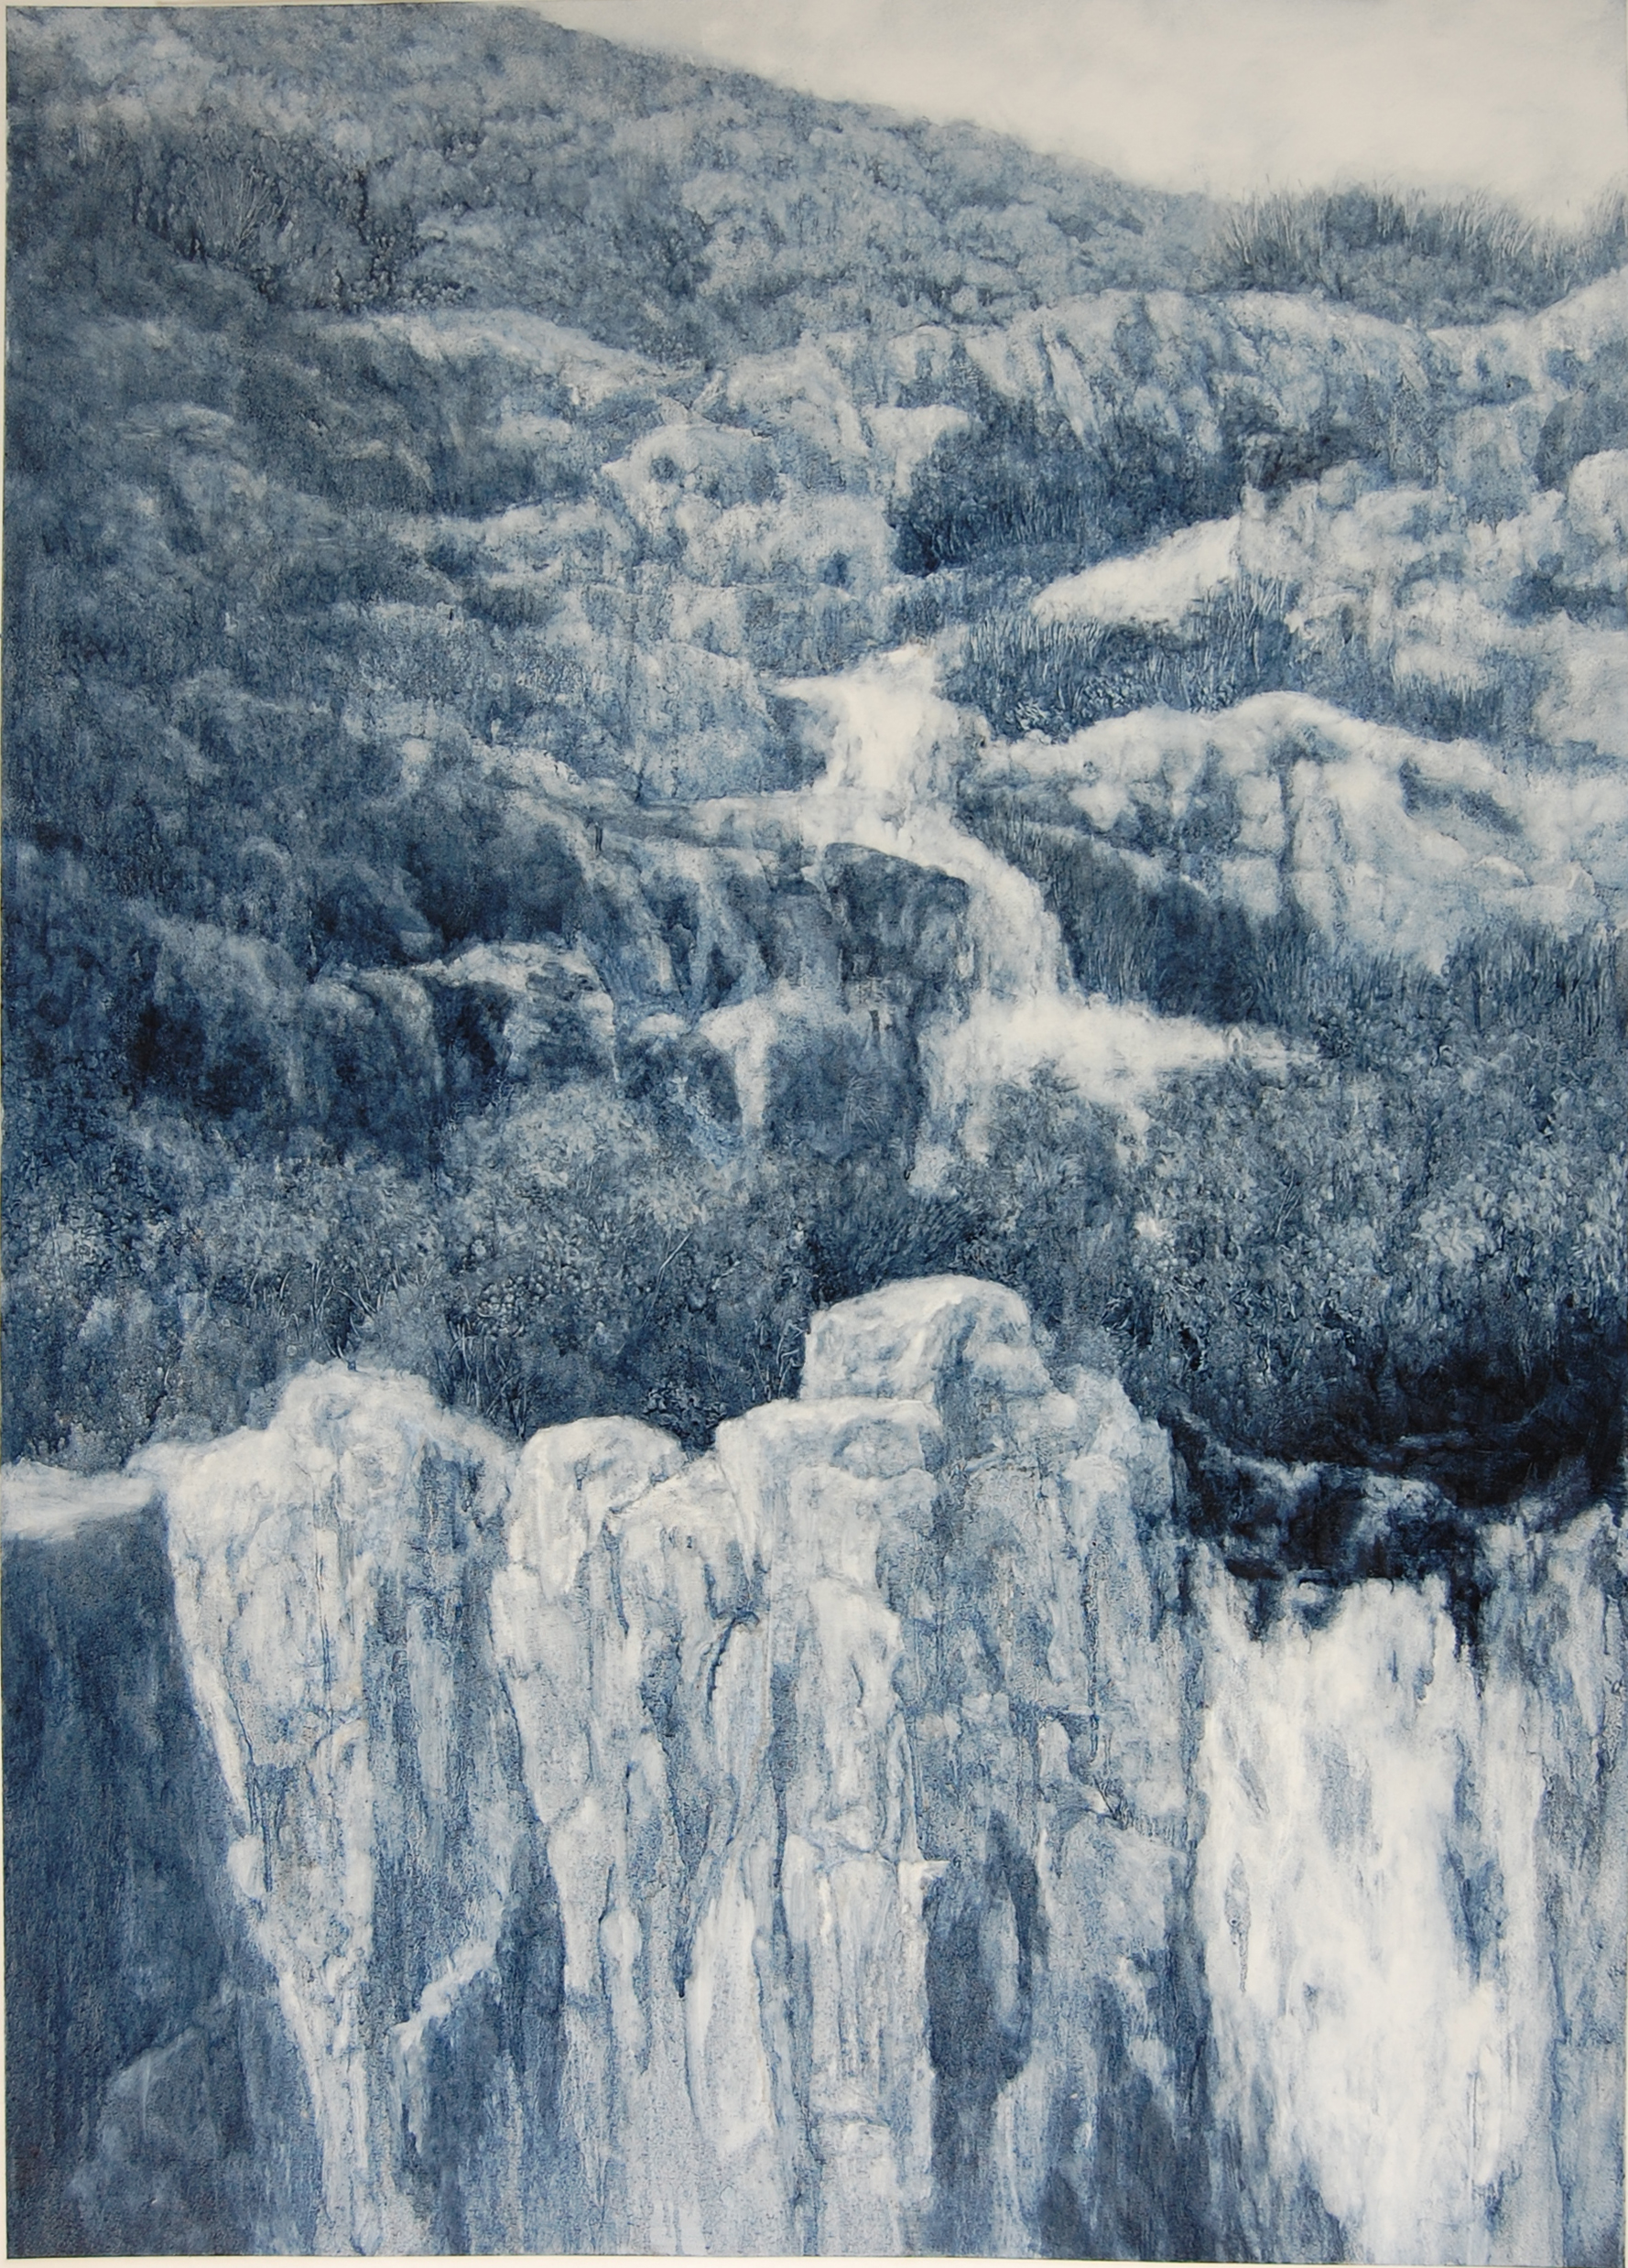 Winter Falls, 2018, oil on paper, 105 x 85cm